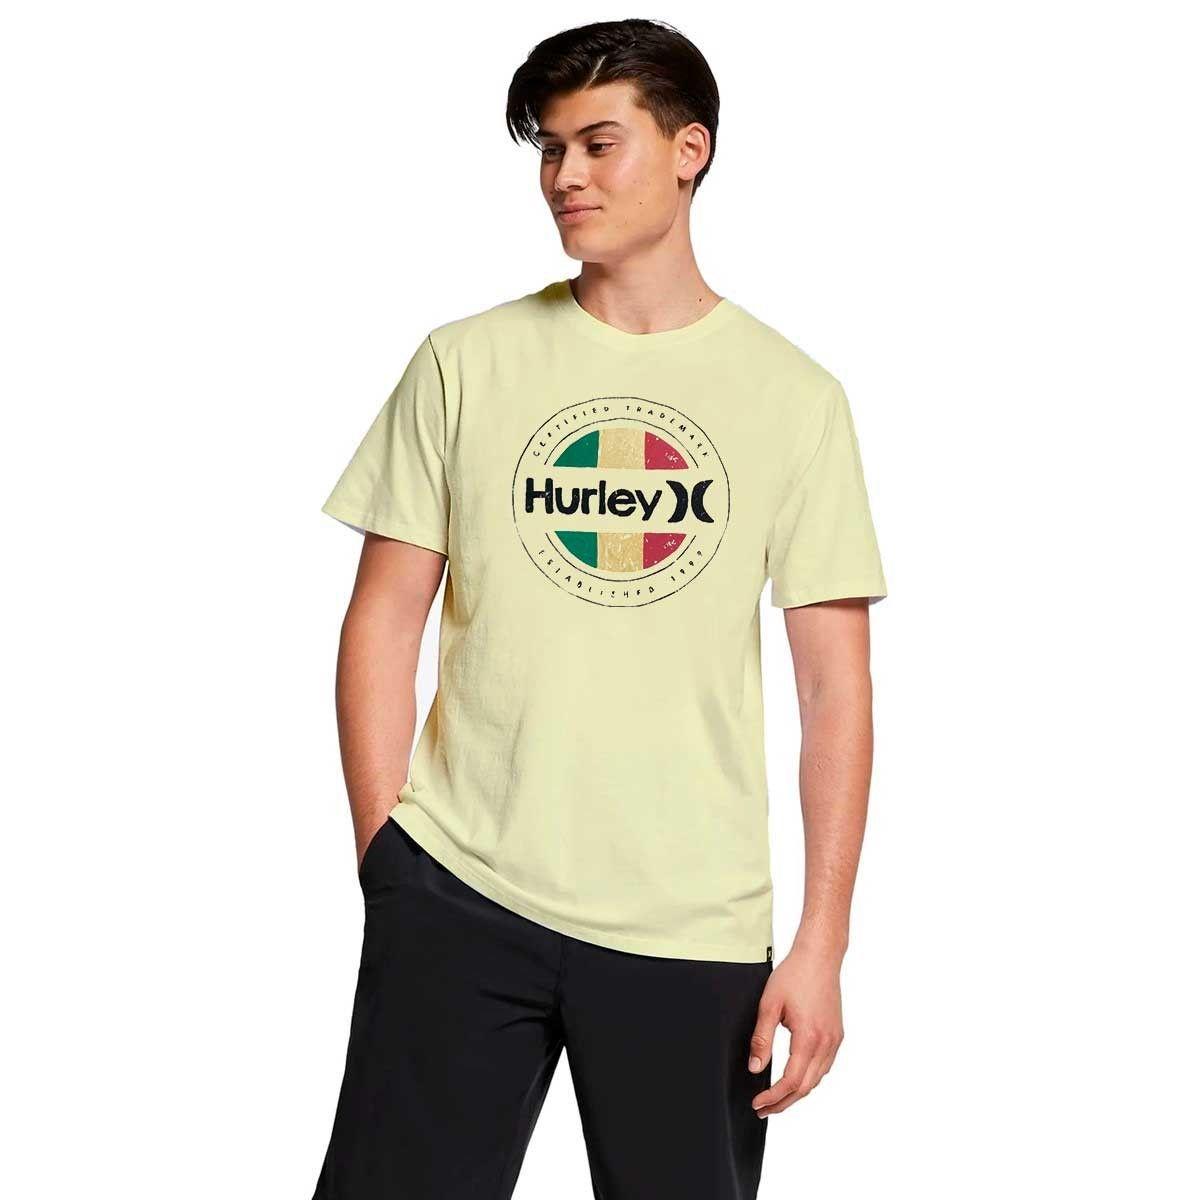 Camiseta Hurley Silk Resistance Yellow